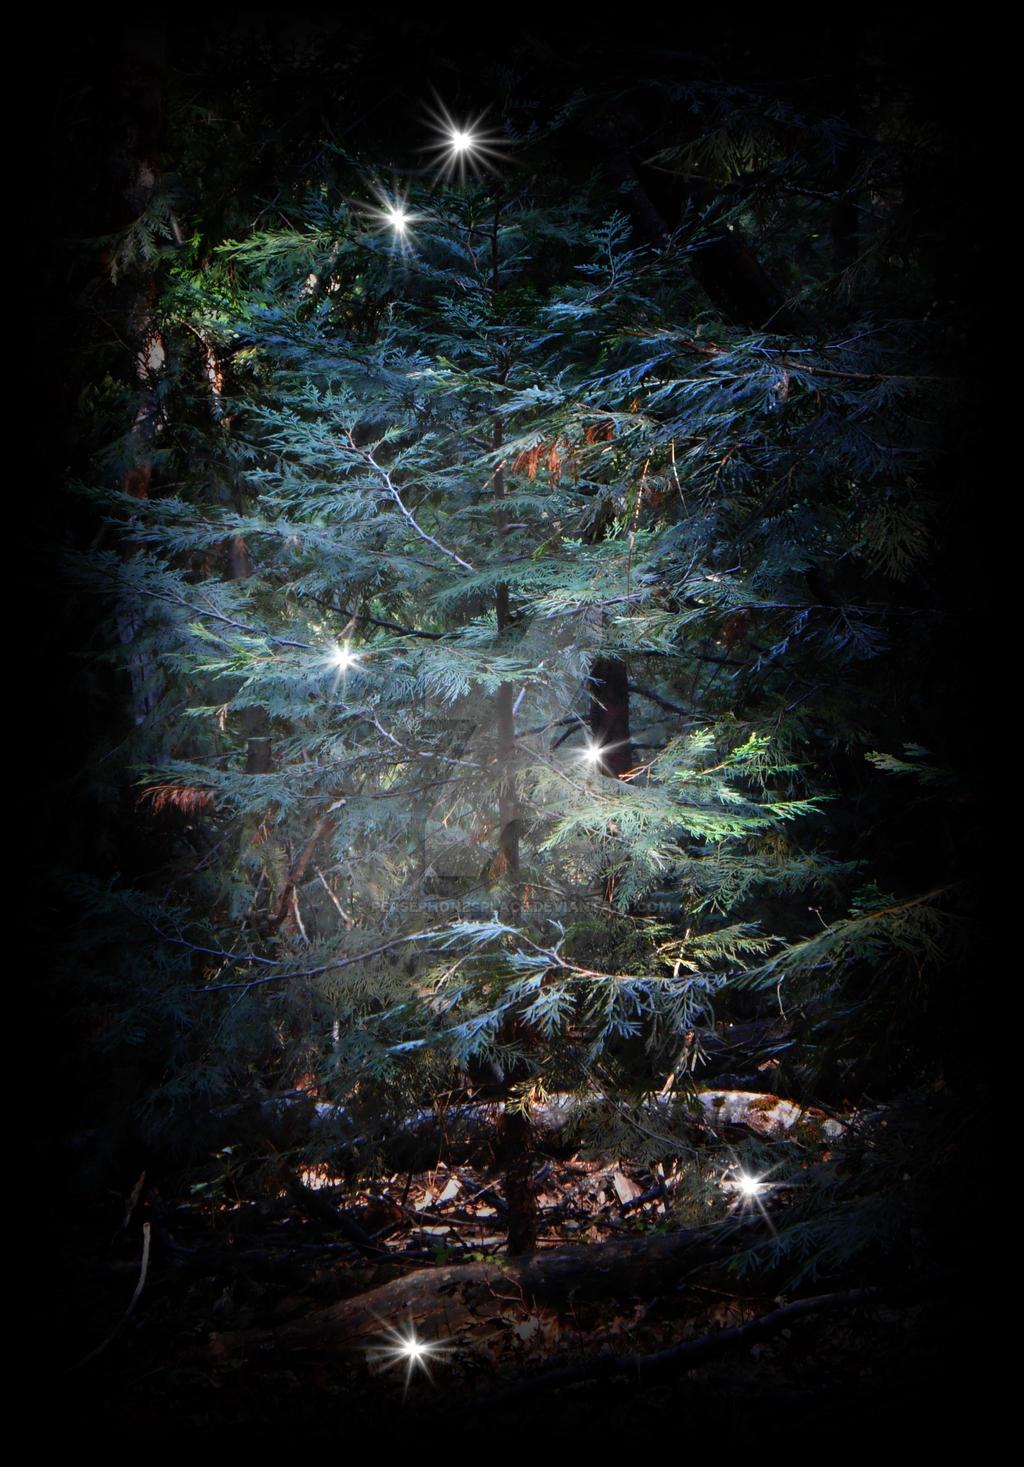 Fairy Tree by Persephonesplace